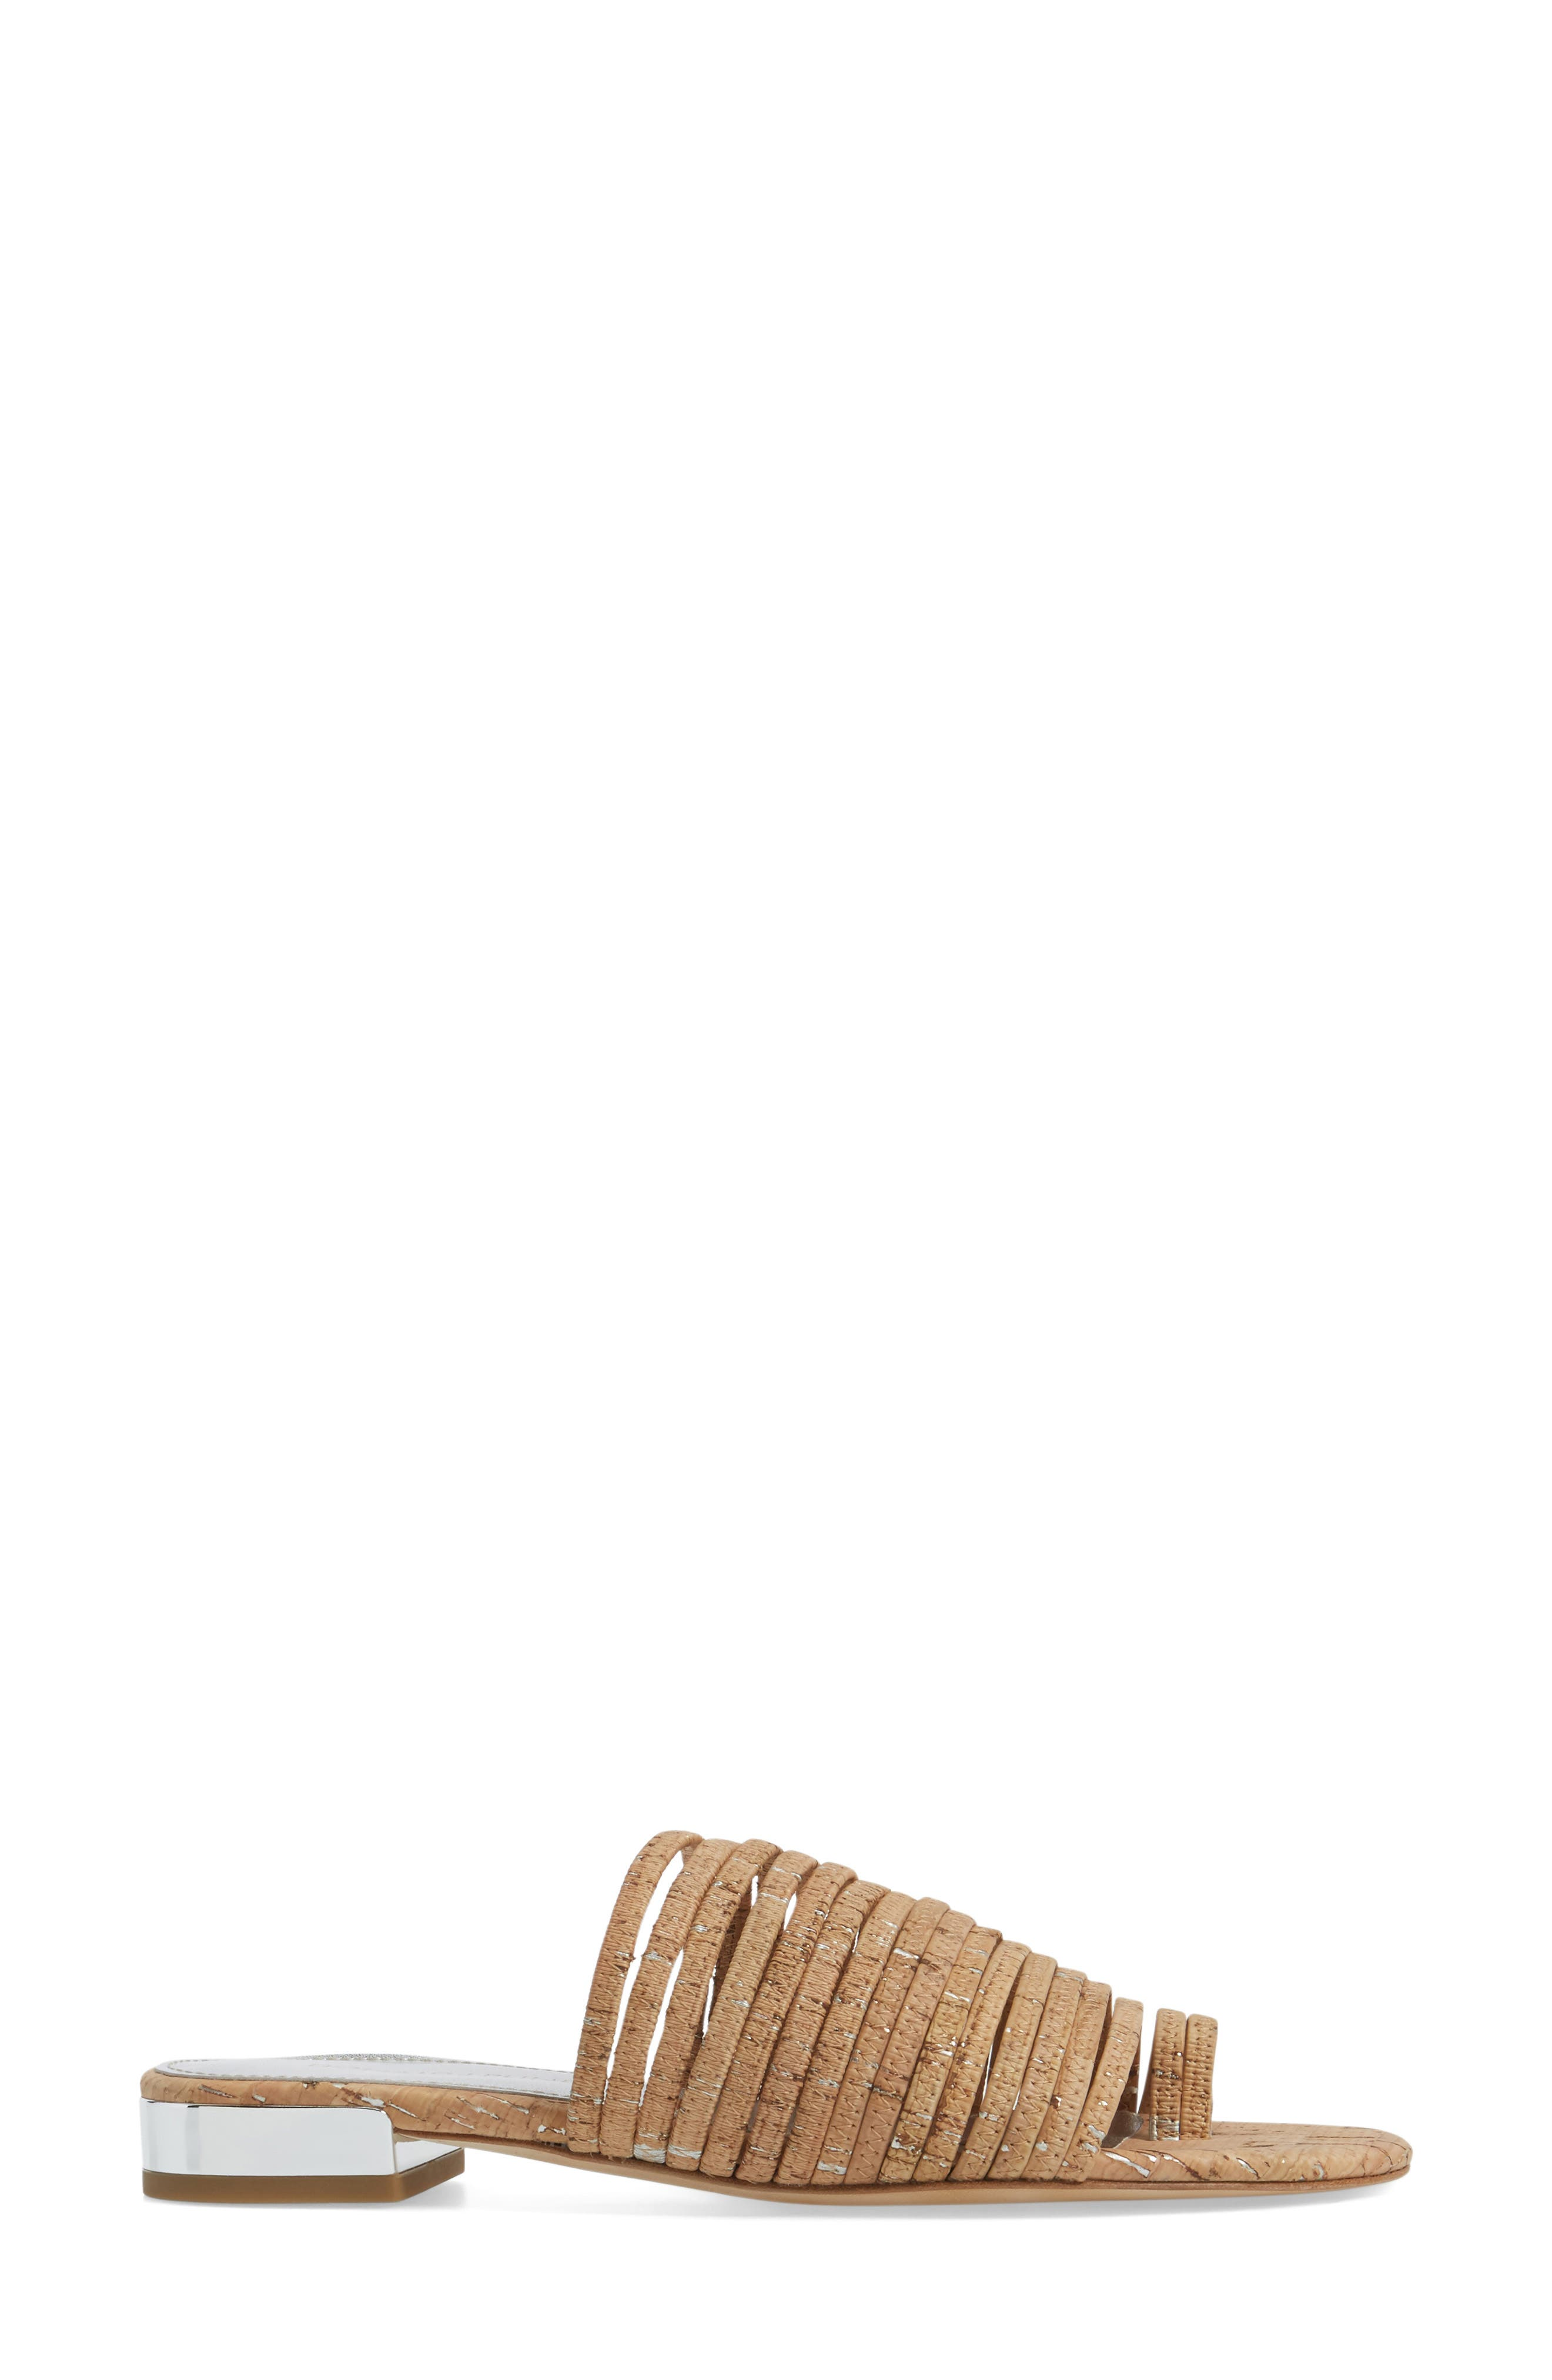 Alternate Image 3  - Donald J Pliner Frea Strappy Sandal (Women)